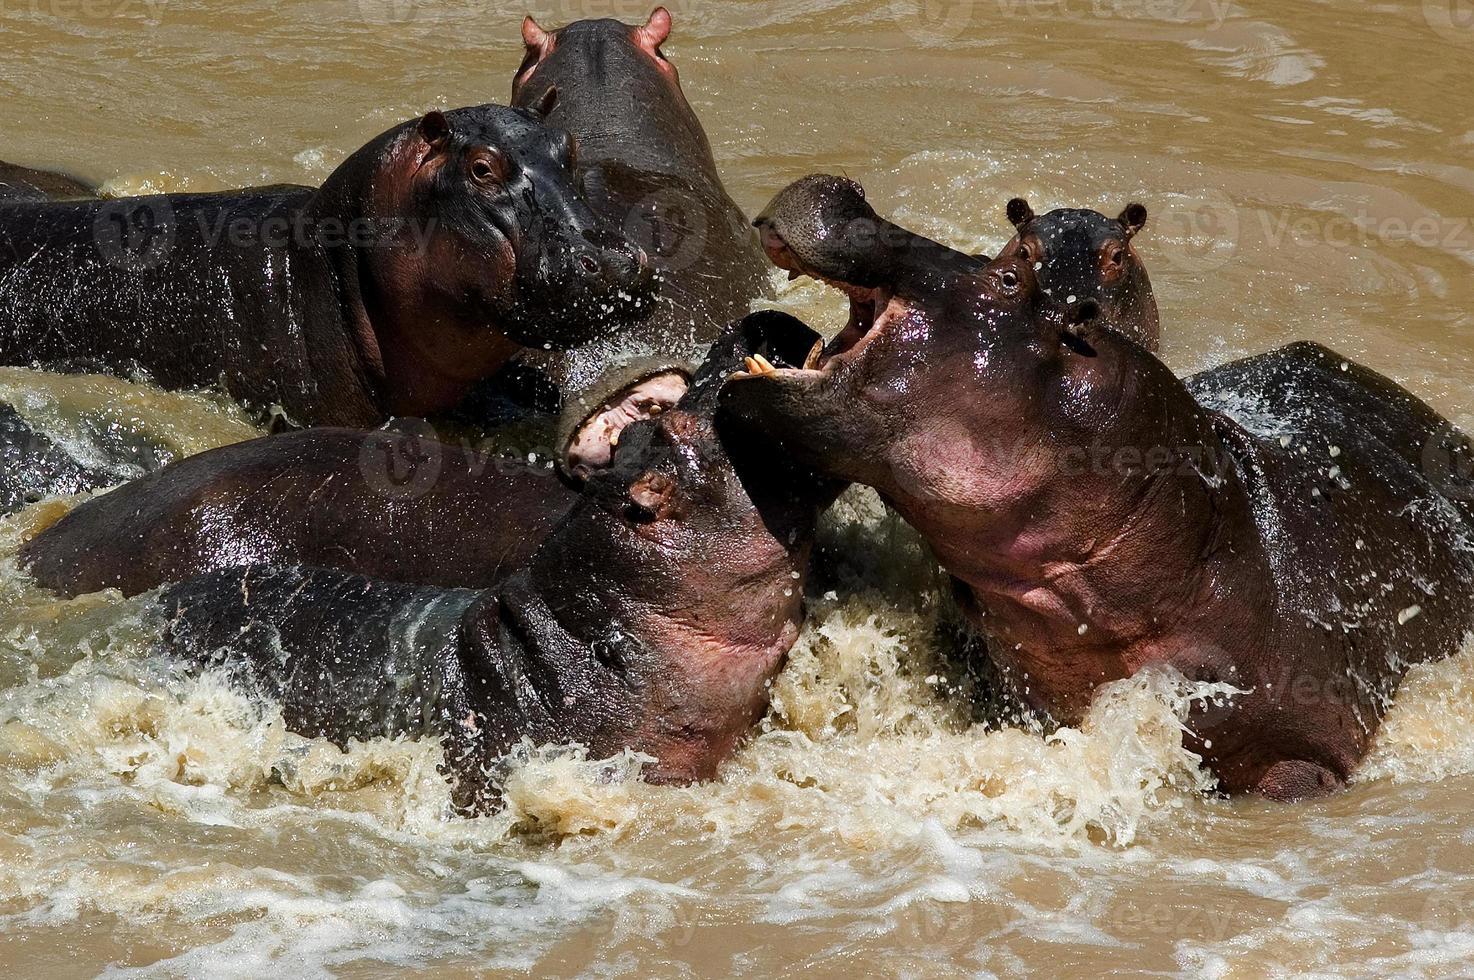 Hippopotames se battre à la rivière Talek, parc national de Masai Mara, Kenya photo